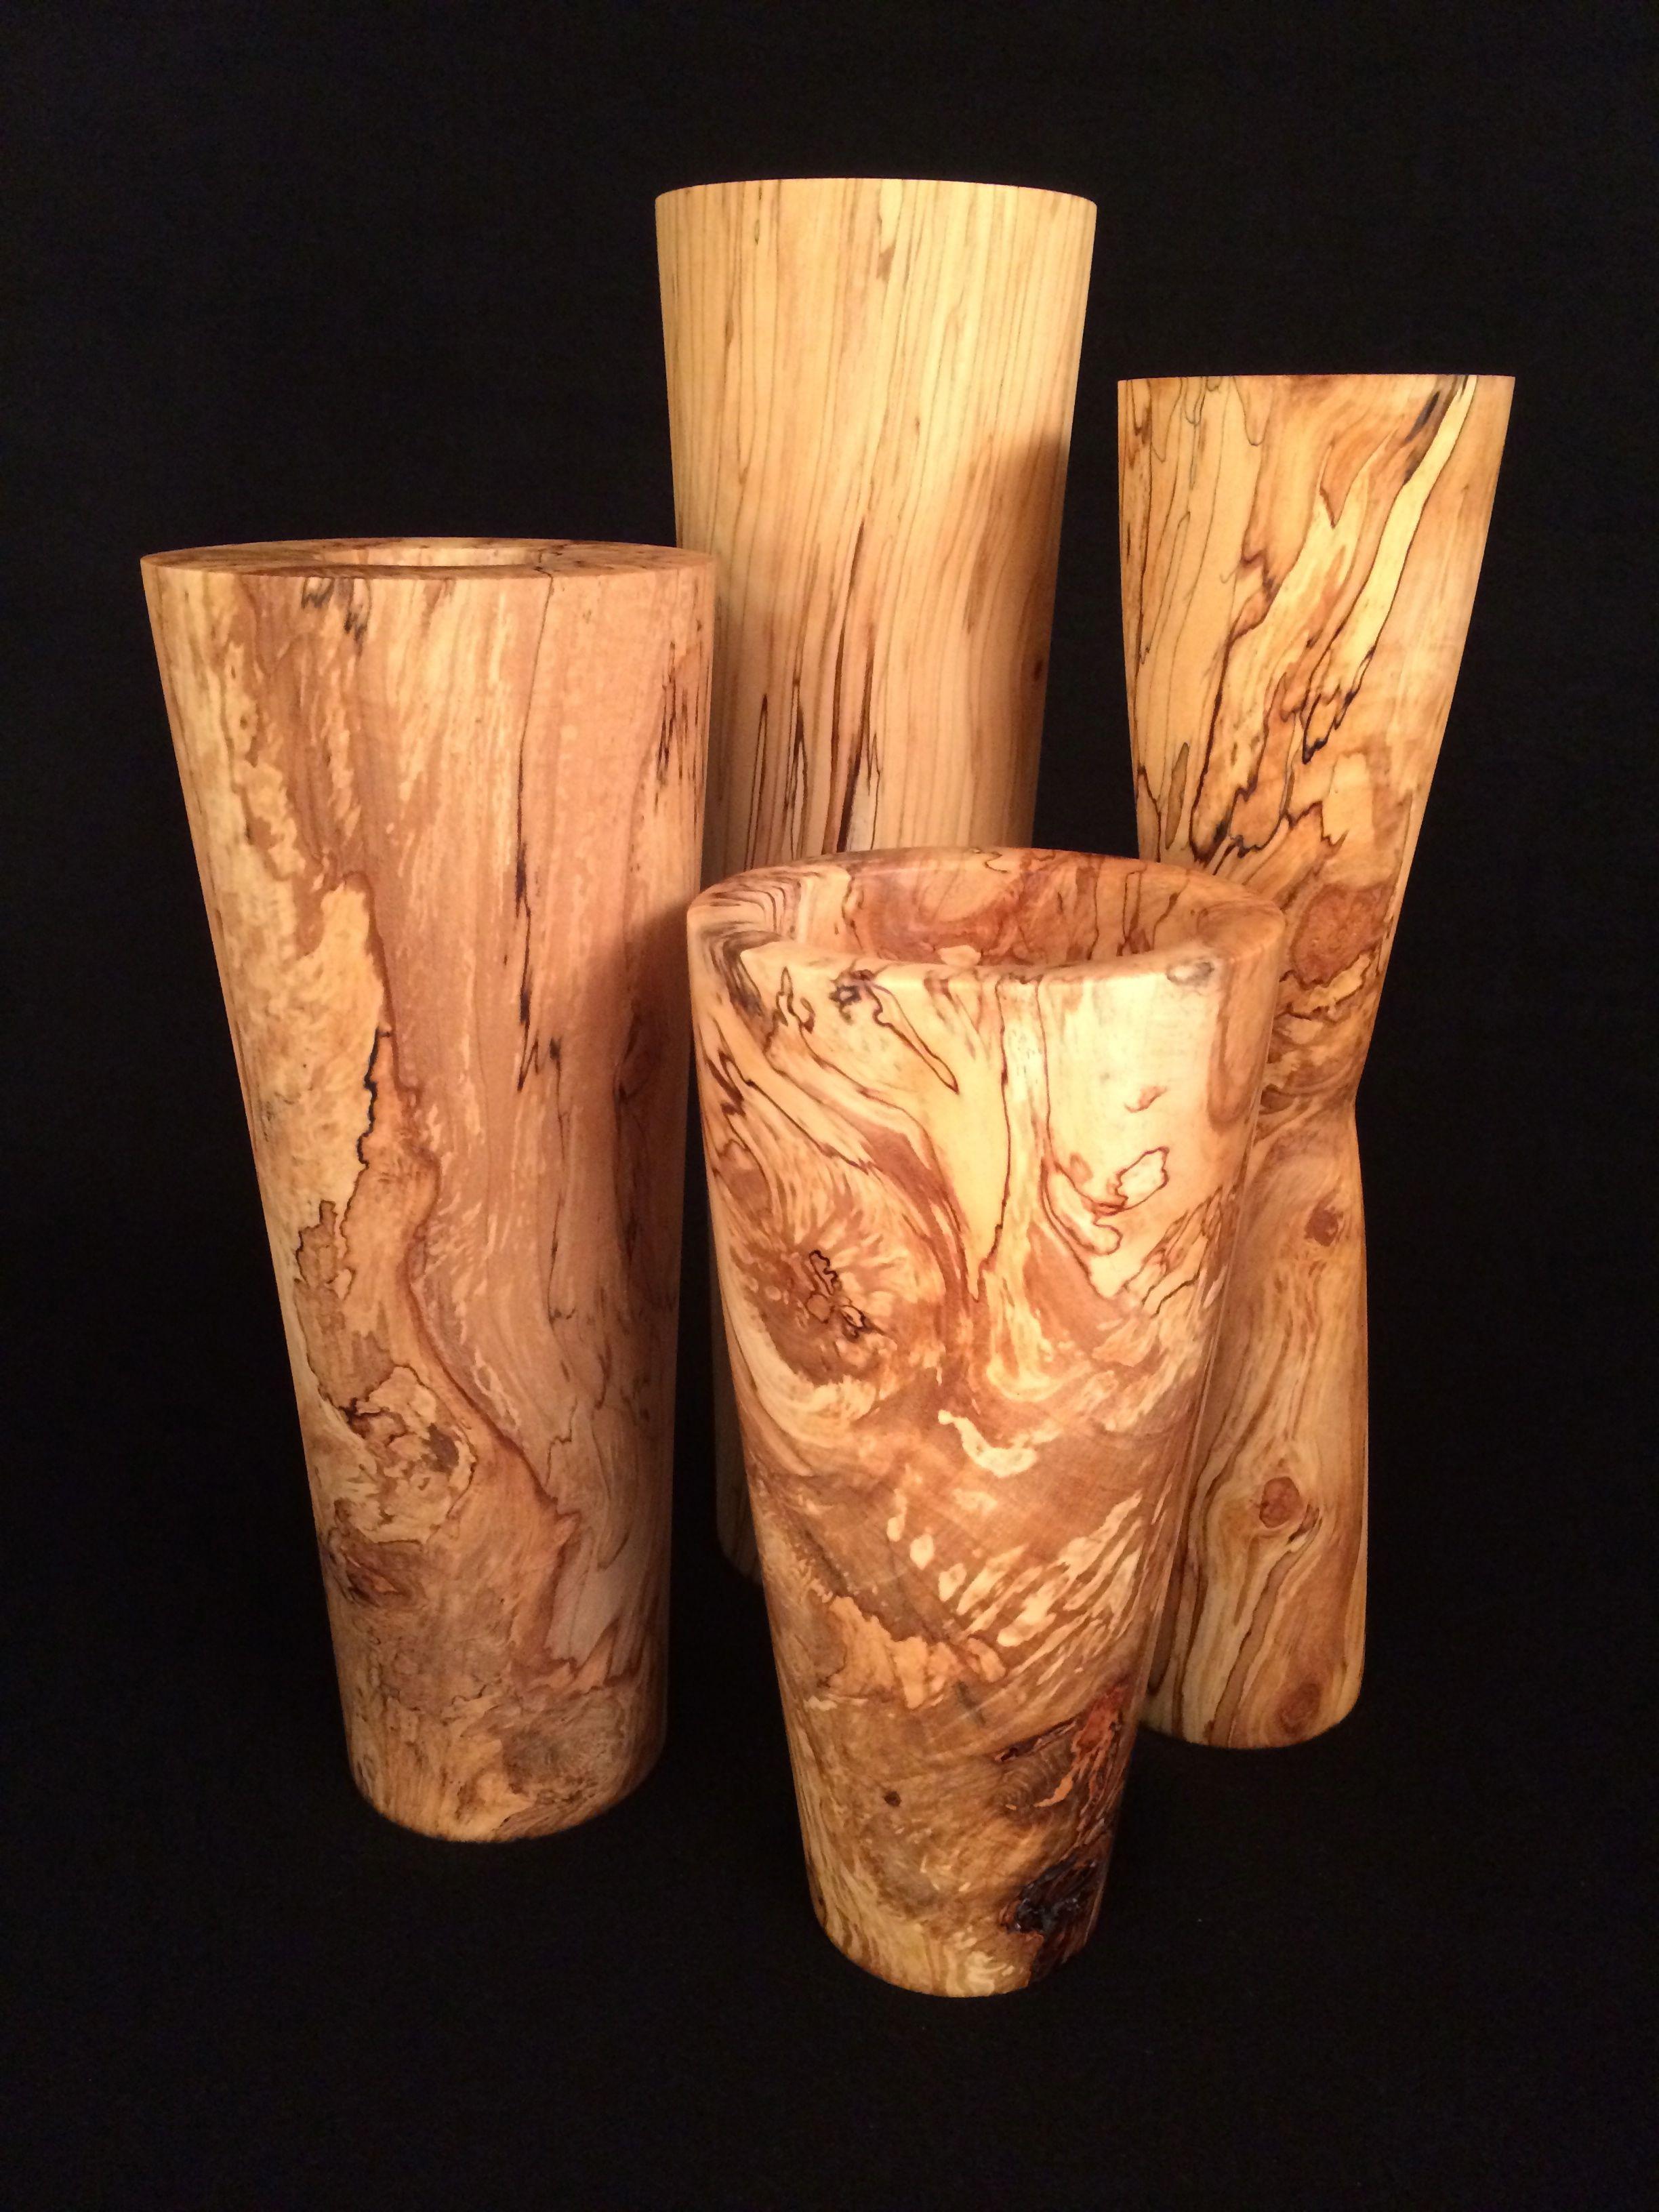 Hand turned wood vases project ideas pinterest turned wood hand turned wood vases reviewsmspy